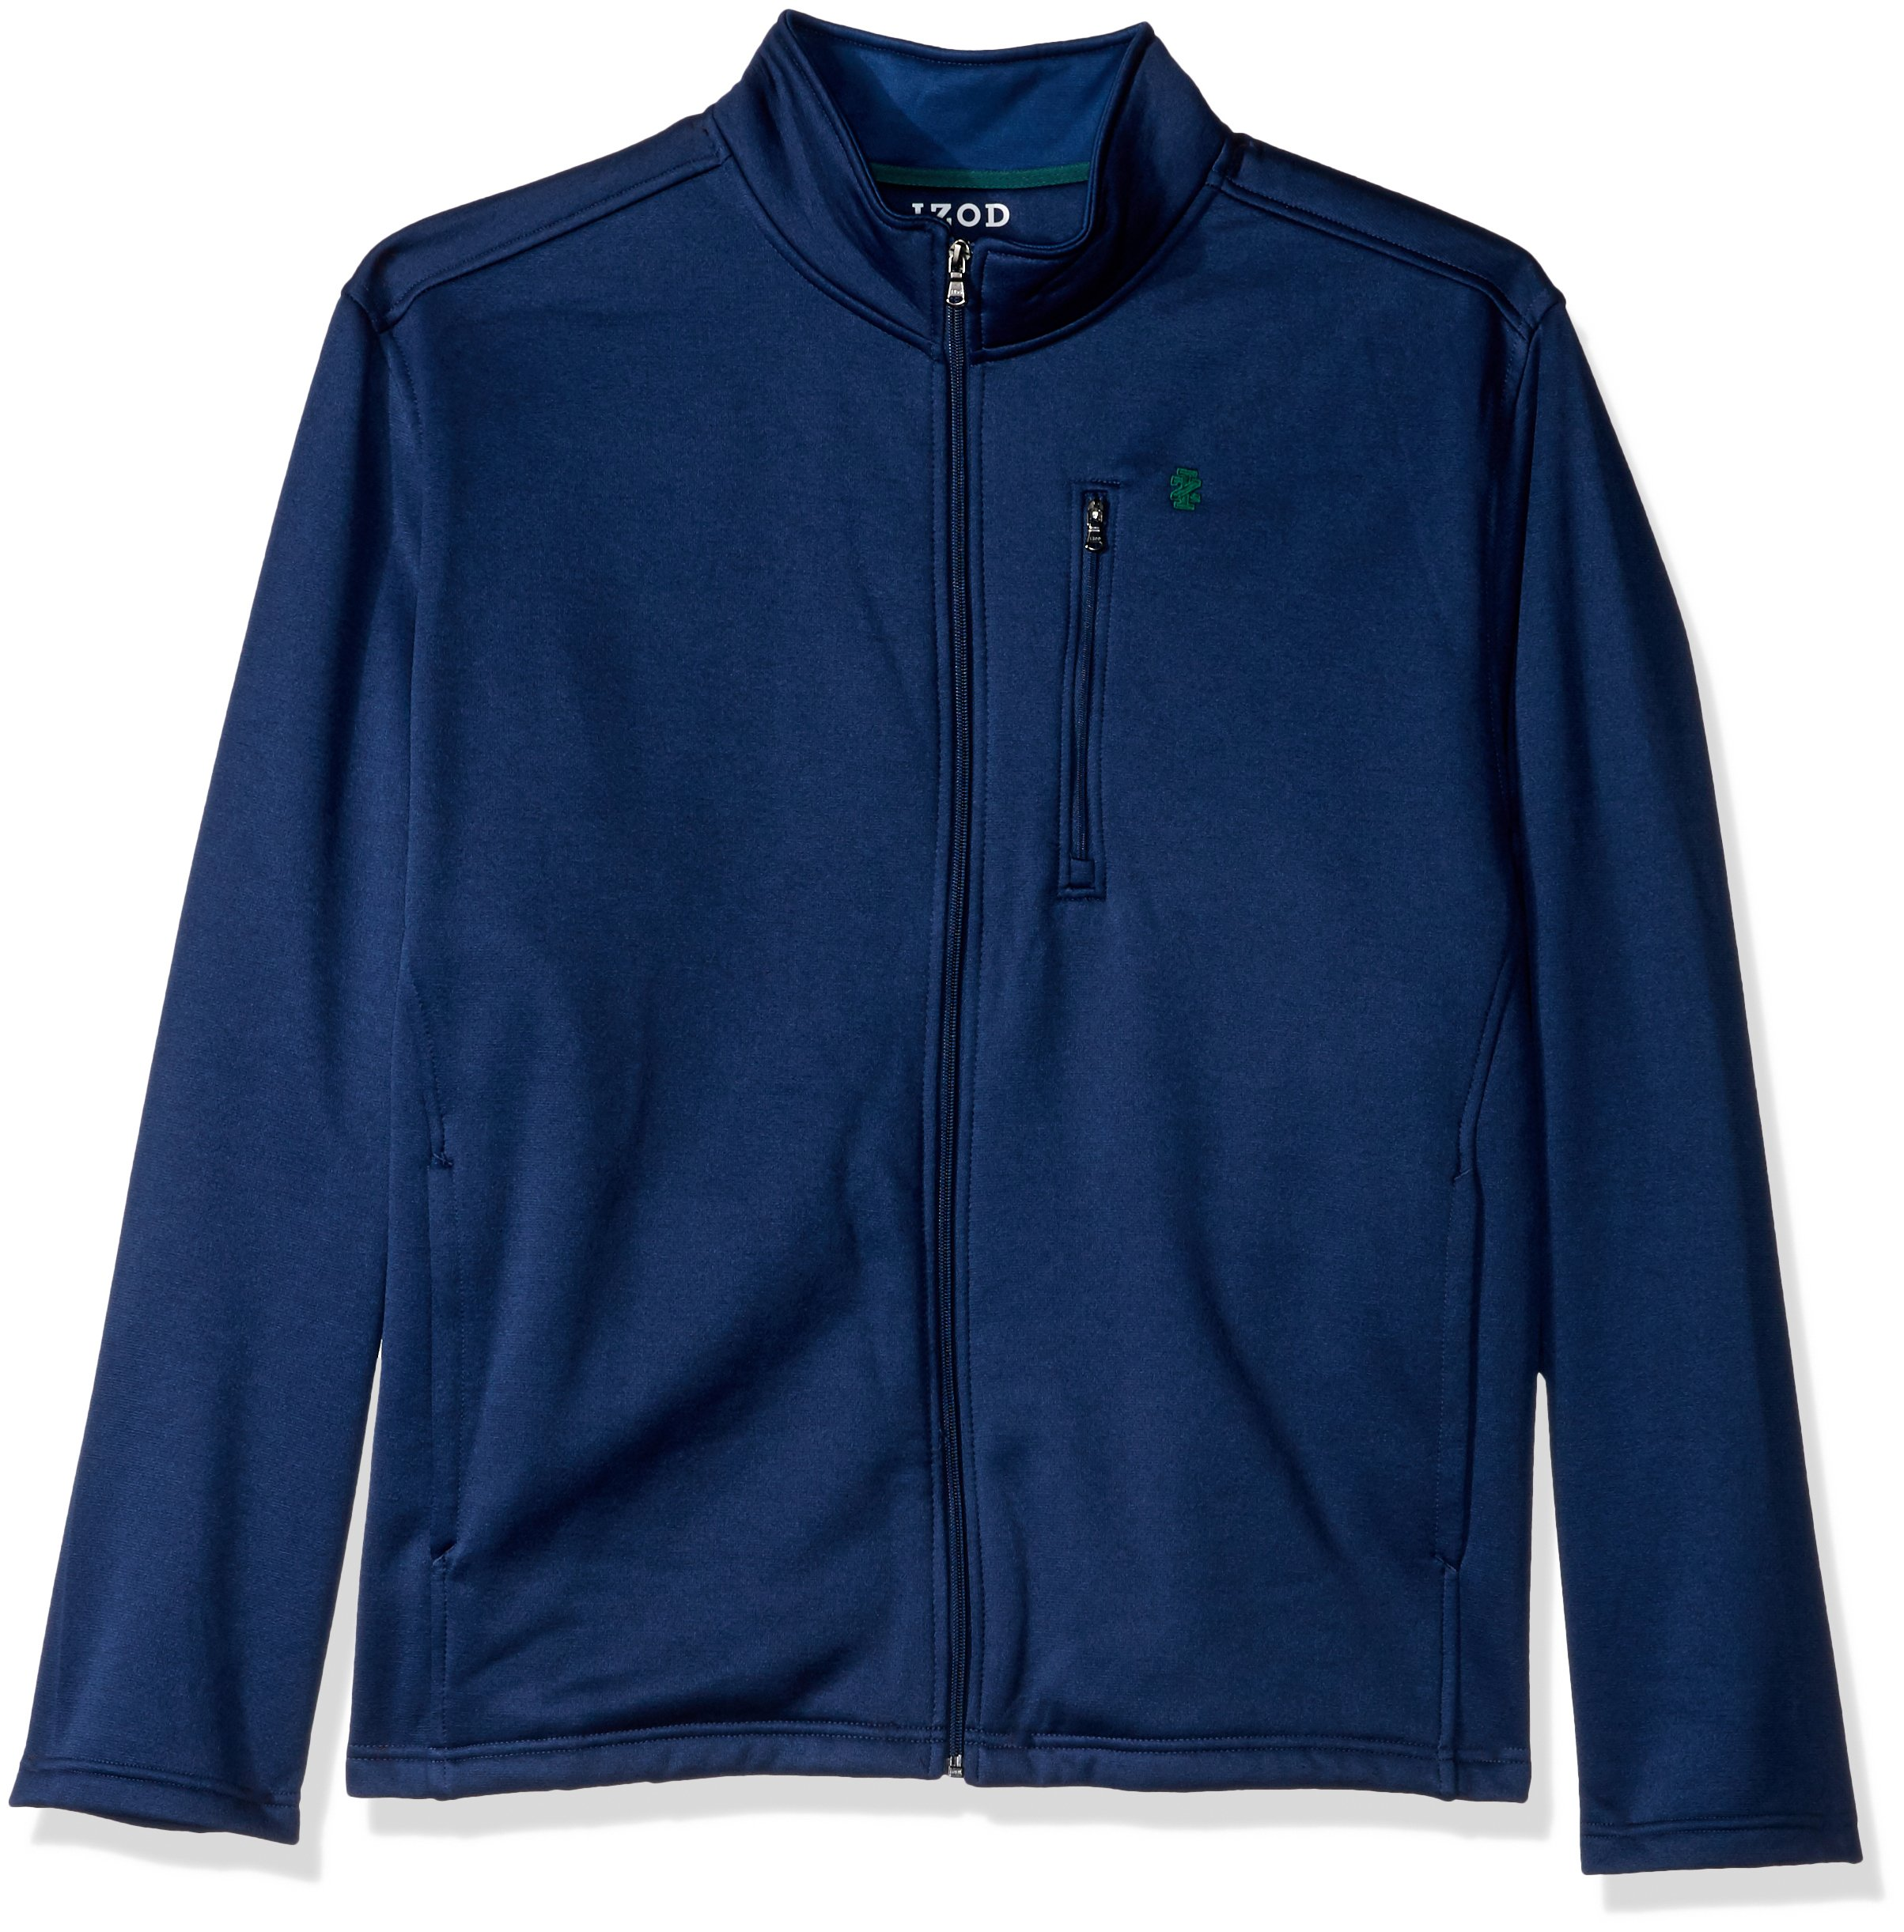 IZOD Men's Big and Tall Spectator Solid Fleece Jacket, Estate Blue Heather, 2X-Large Tall